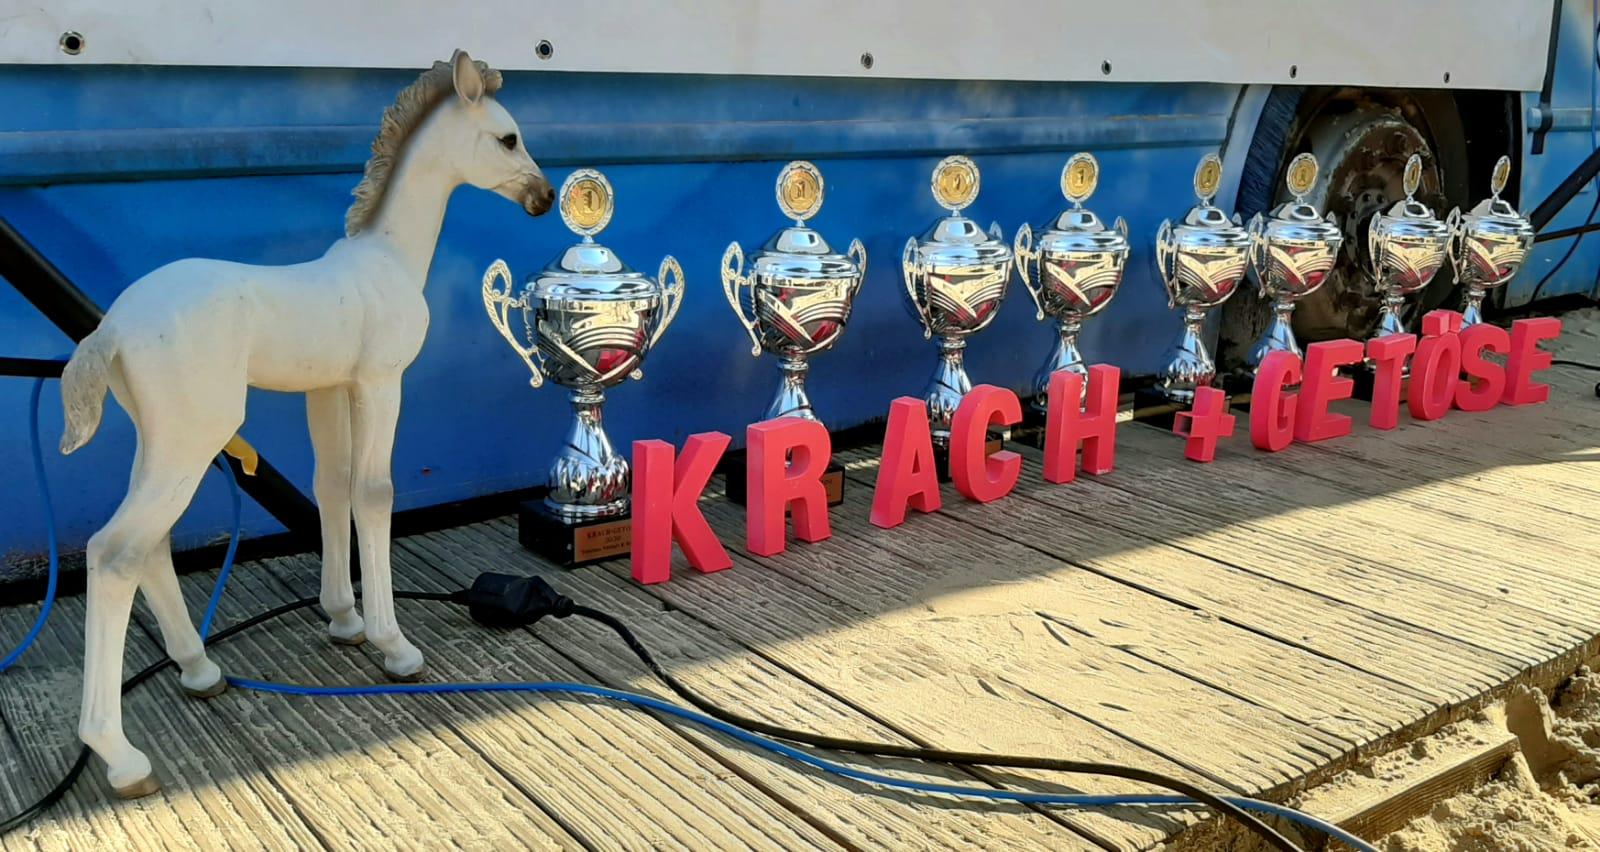 Krach+Getöse, Newcomer, Award, Preisverleihung, Pokale, Pferd